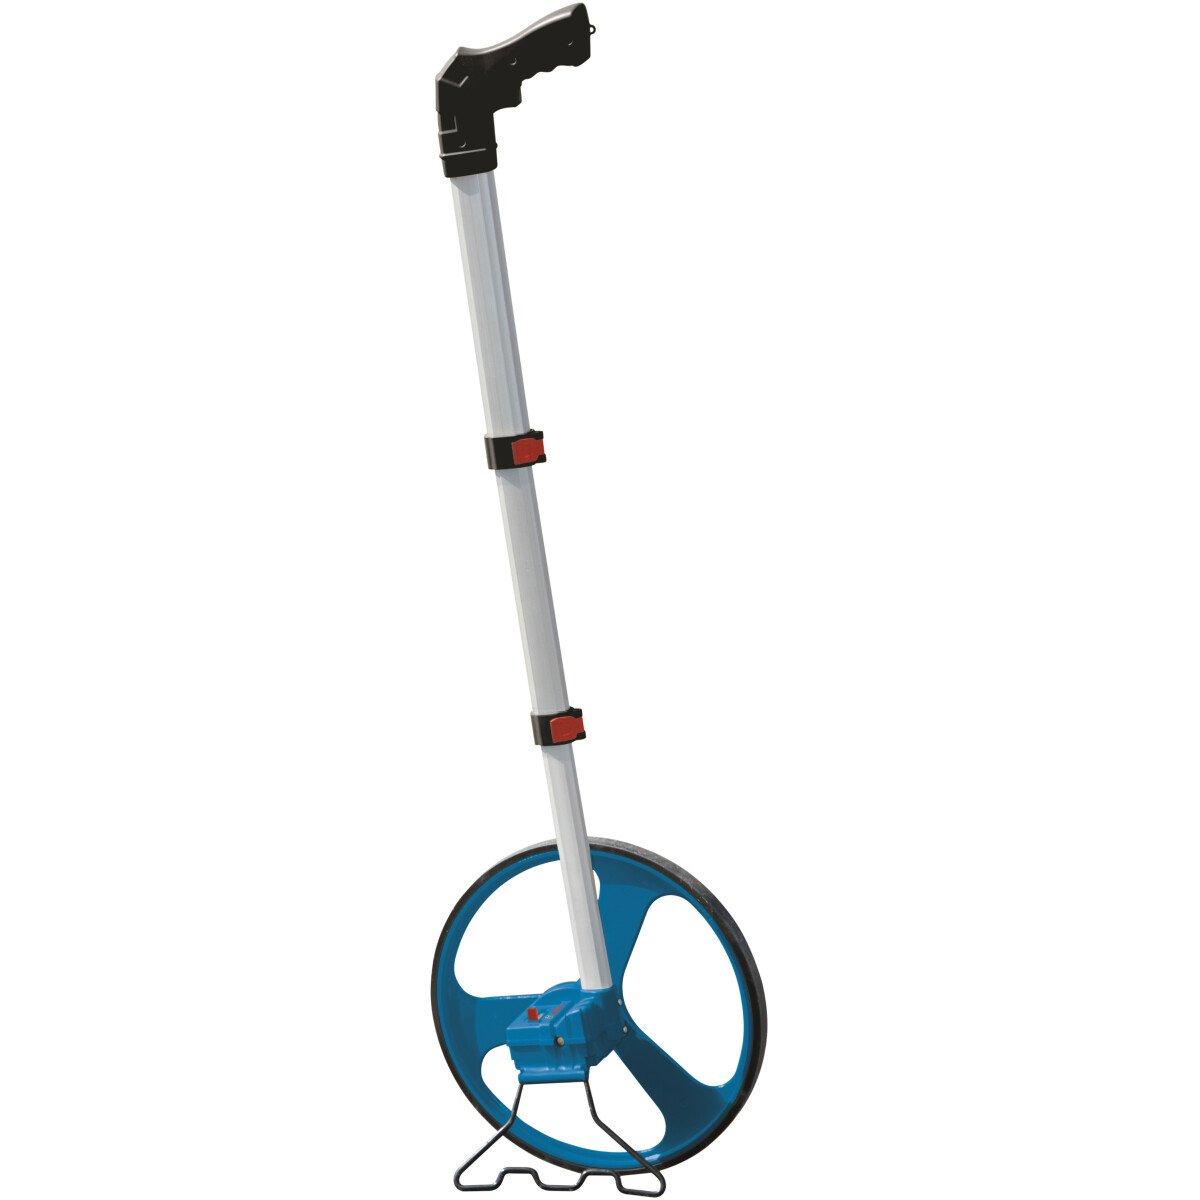 Bosch GWM32 Professional Measuring Wheel32cm wheel Diameter